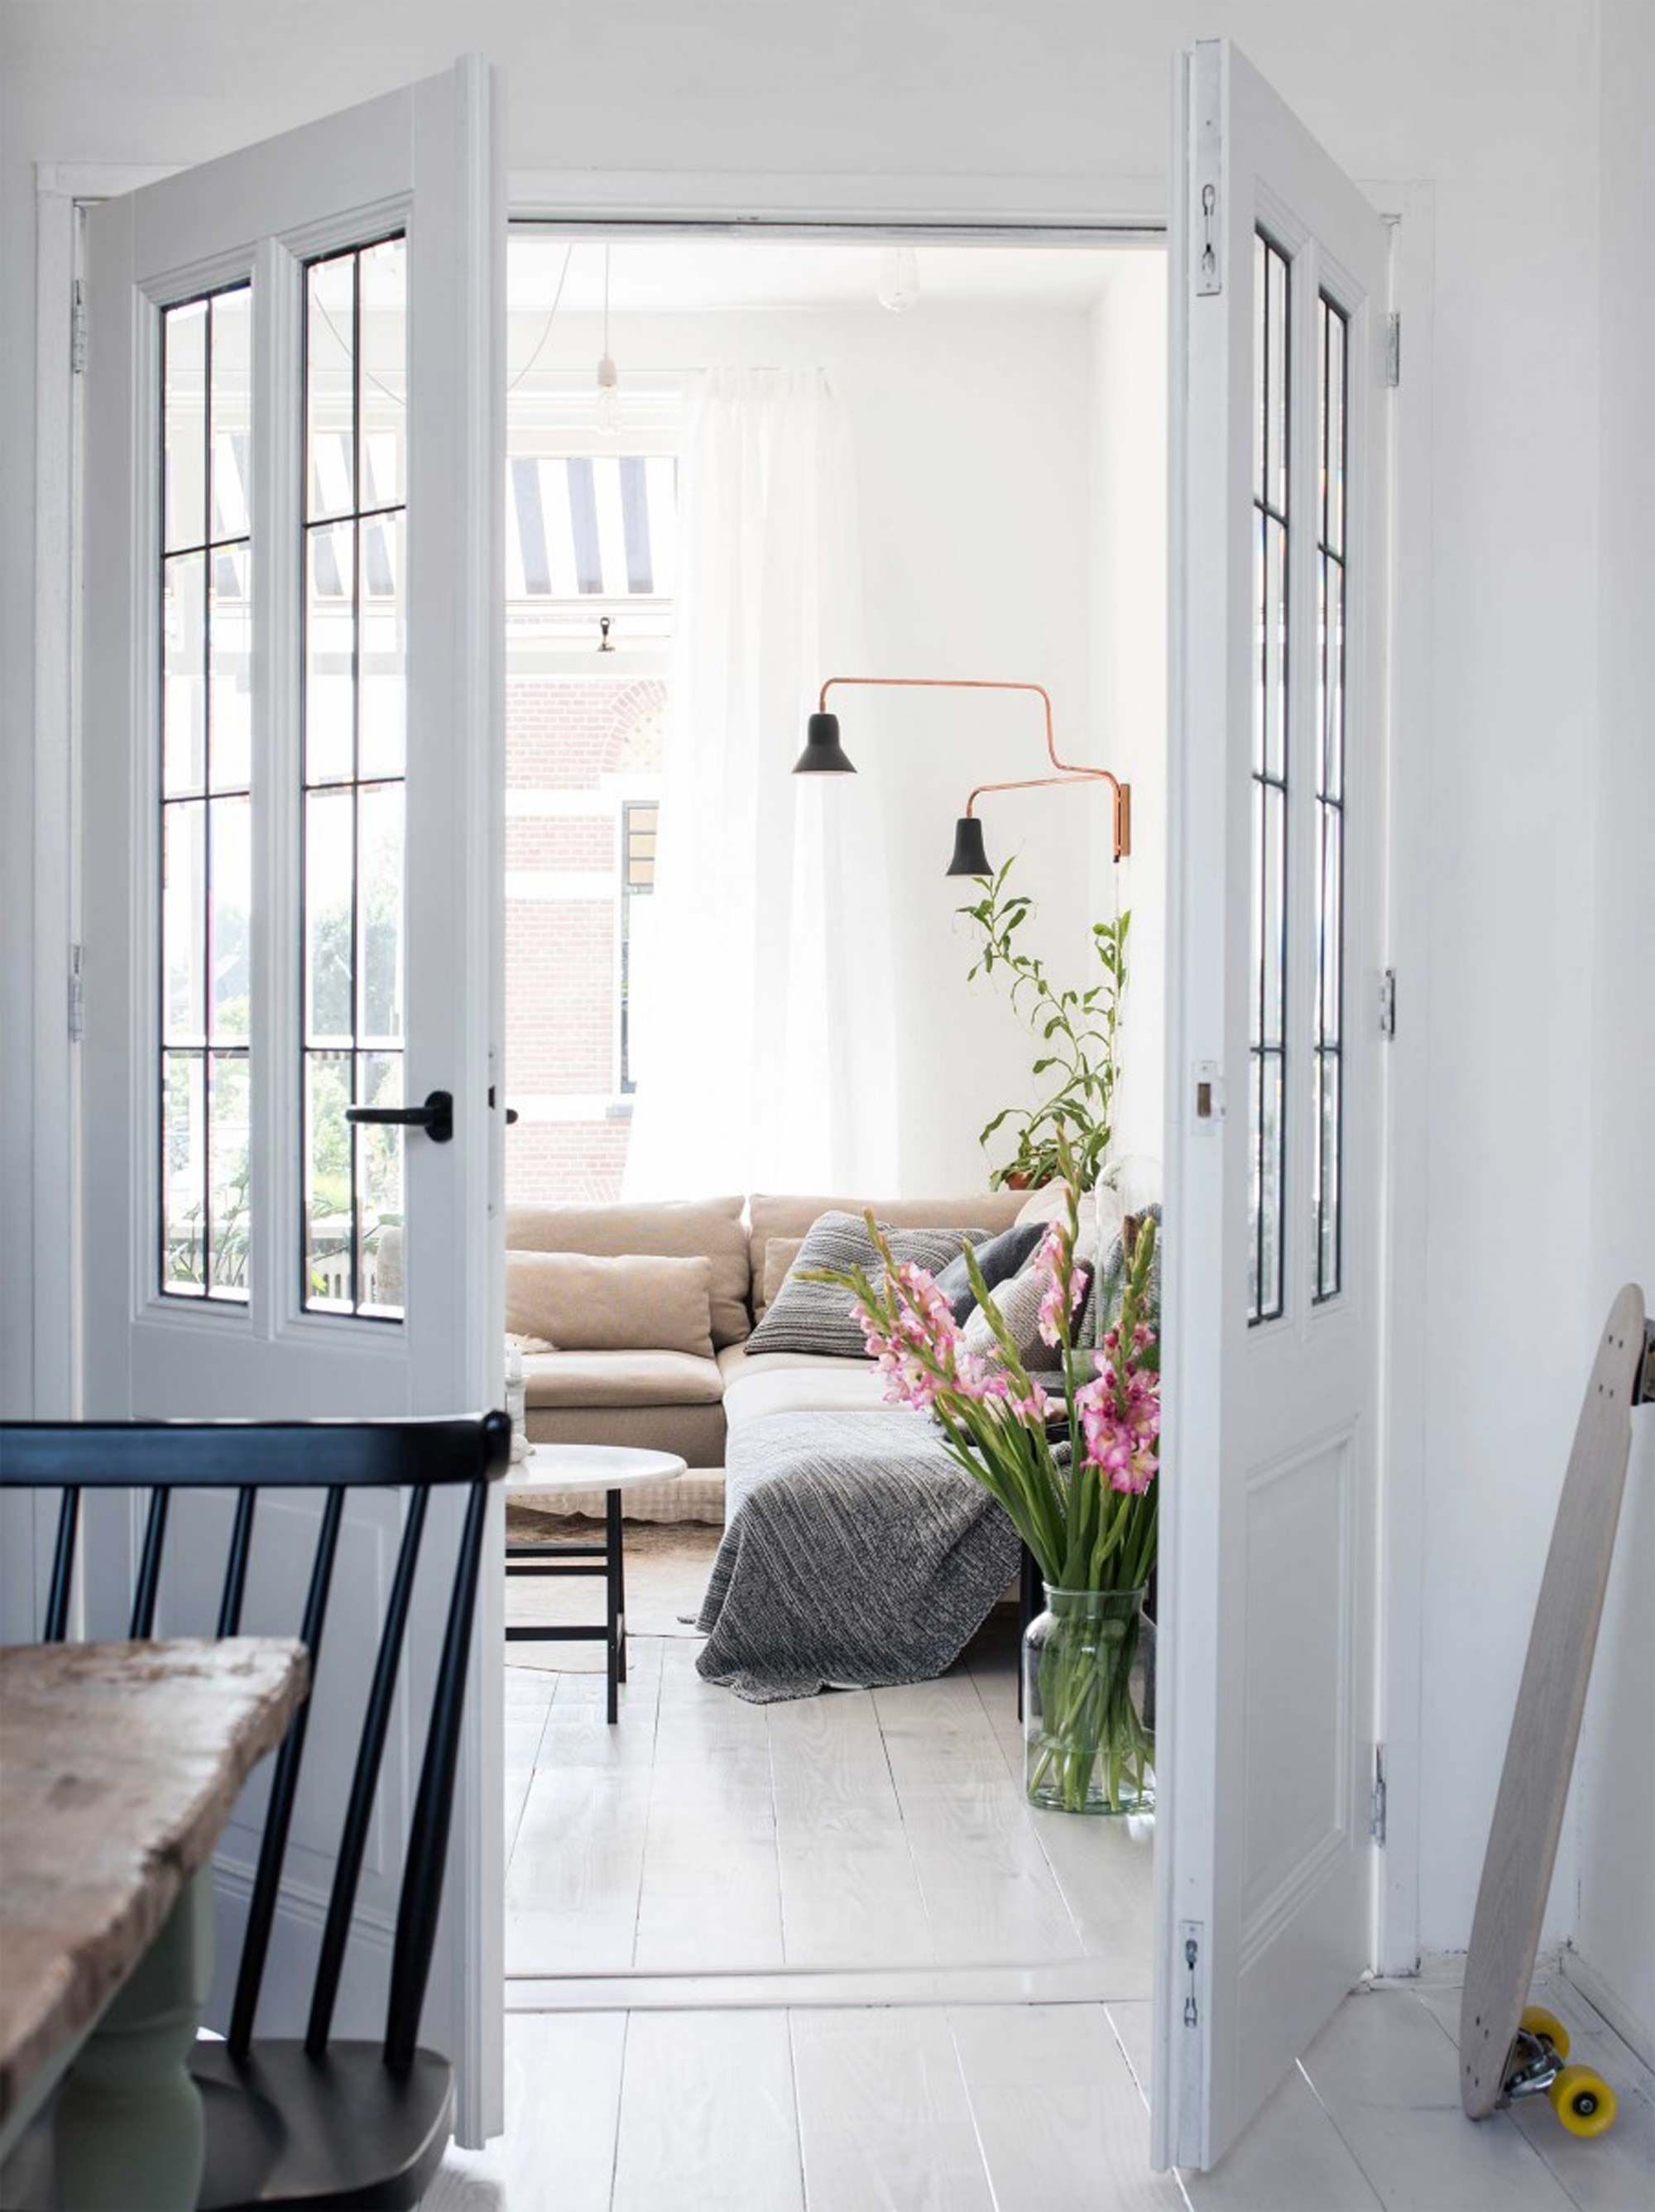 woonkamer   Livingroom   Photography Jansje Klazinga   Styling Emmy van Dantzig   Tekst Els Meyer   Bron: vtwonen 2 2016